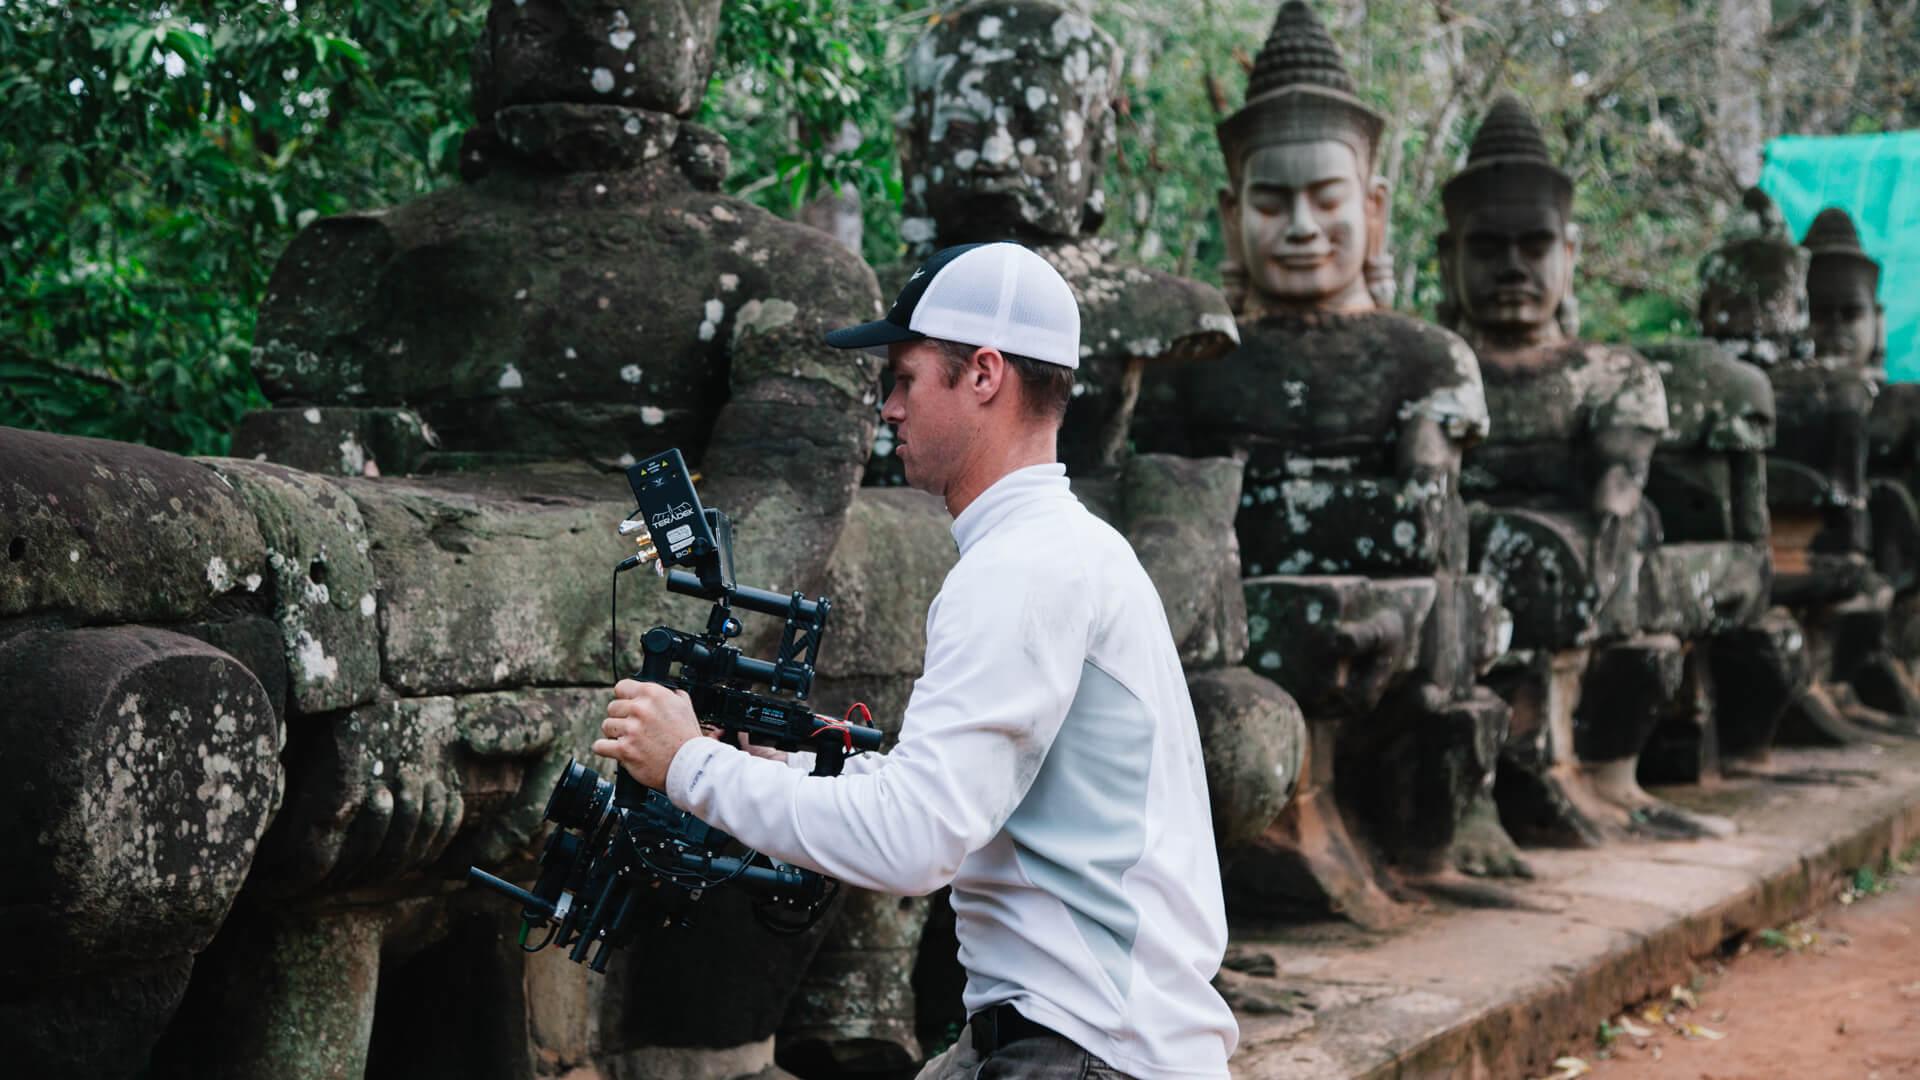 movi-operator-sam-nuttmann-cambodia-bbc-monsoon-statues